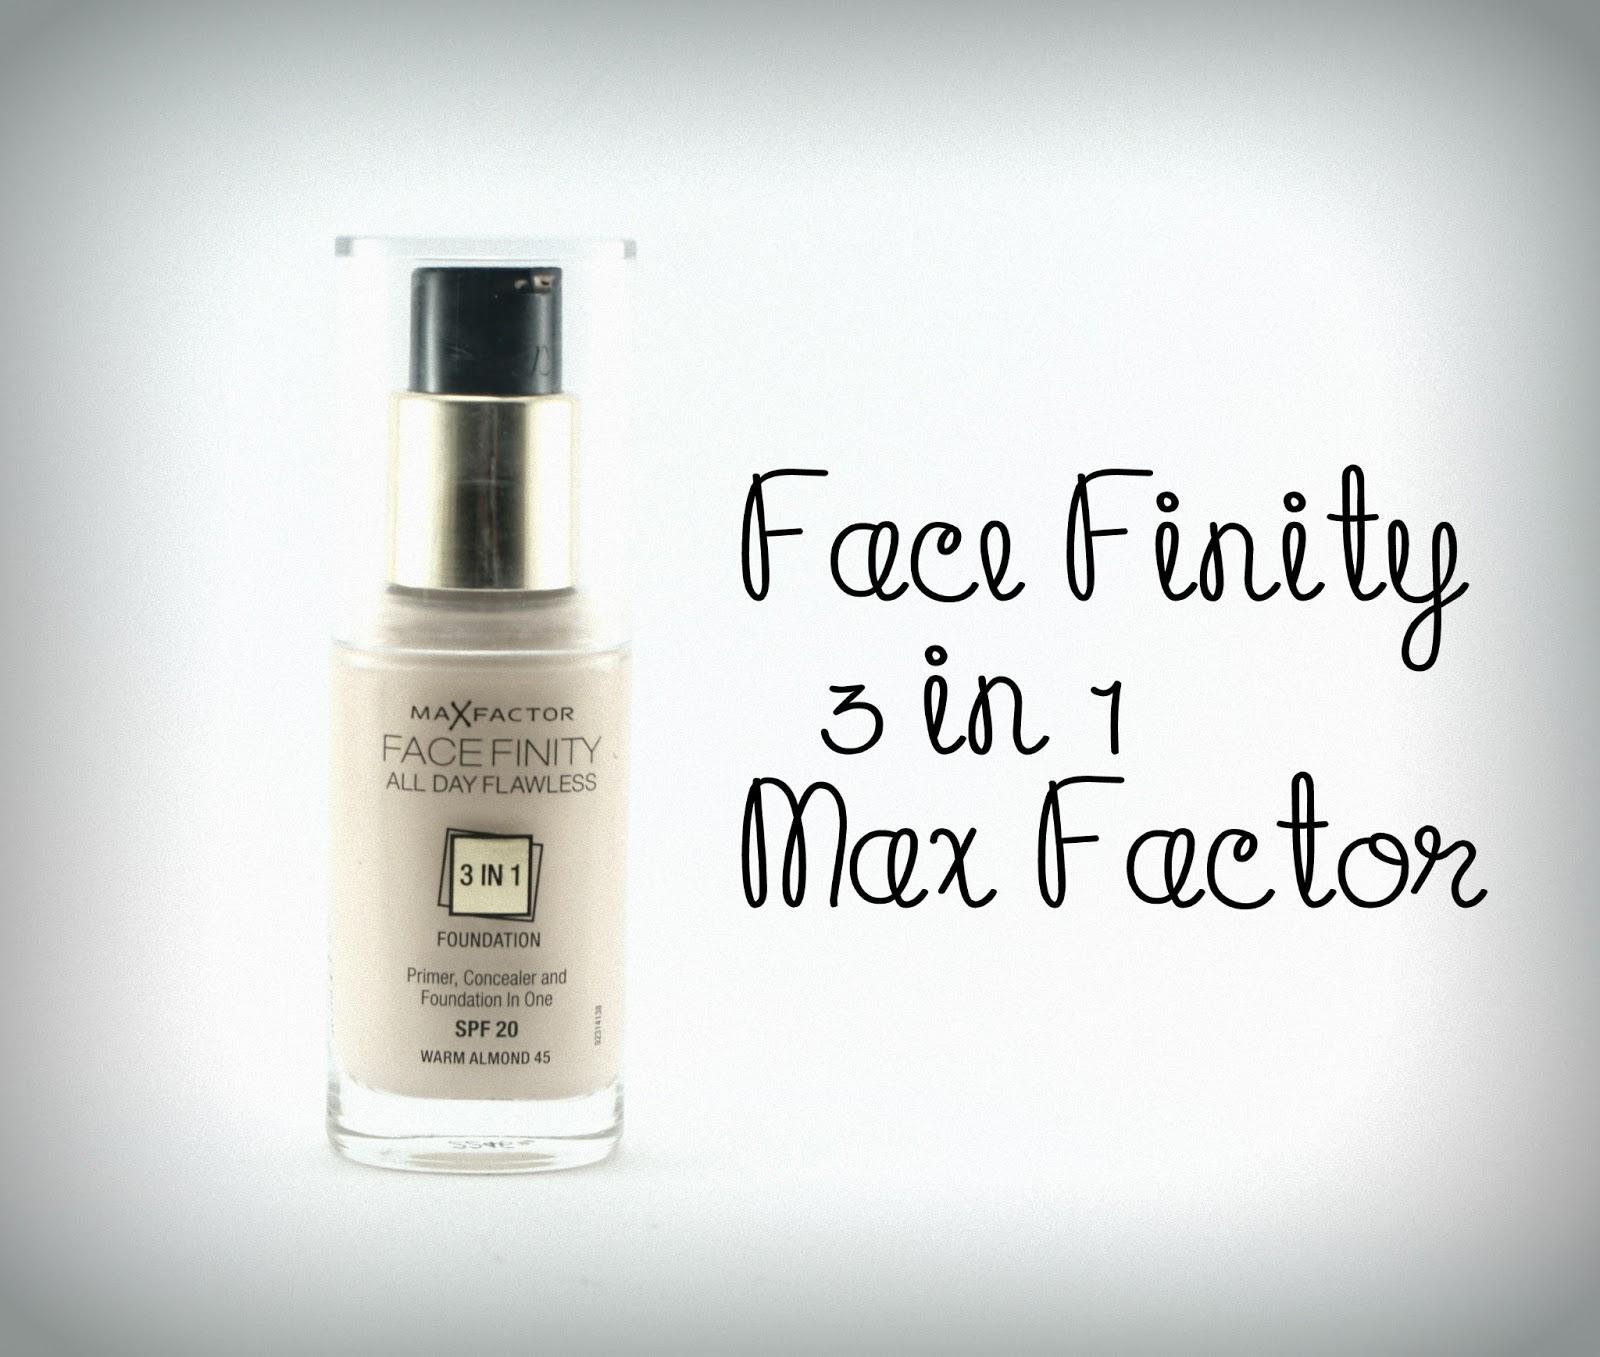 prebase de maquillaje max factor